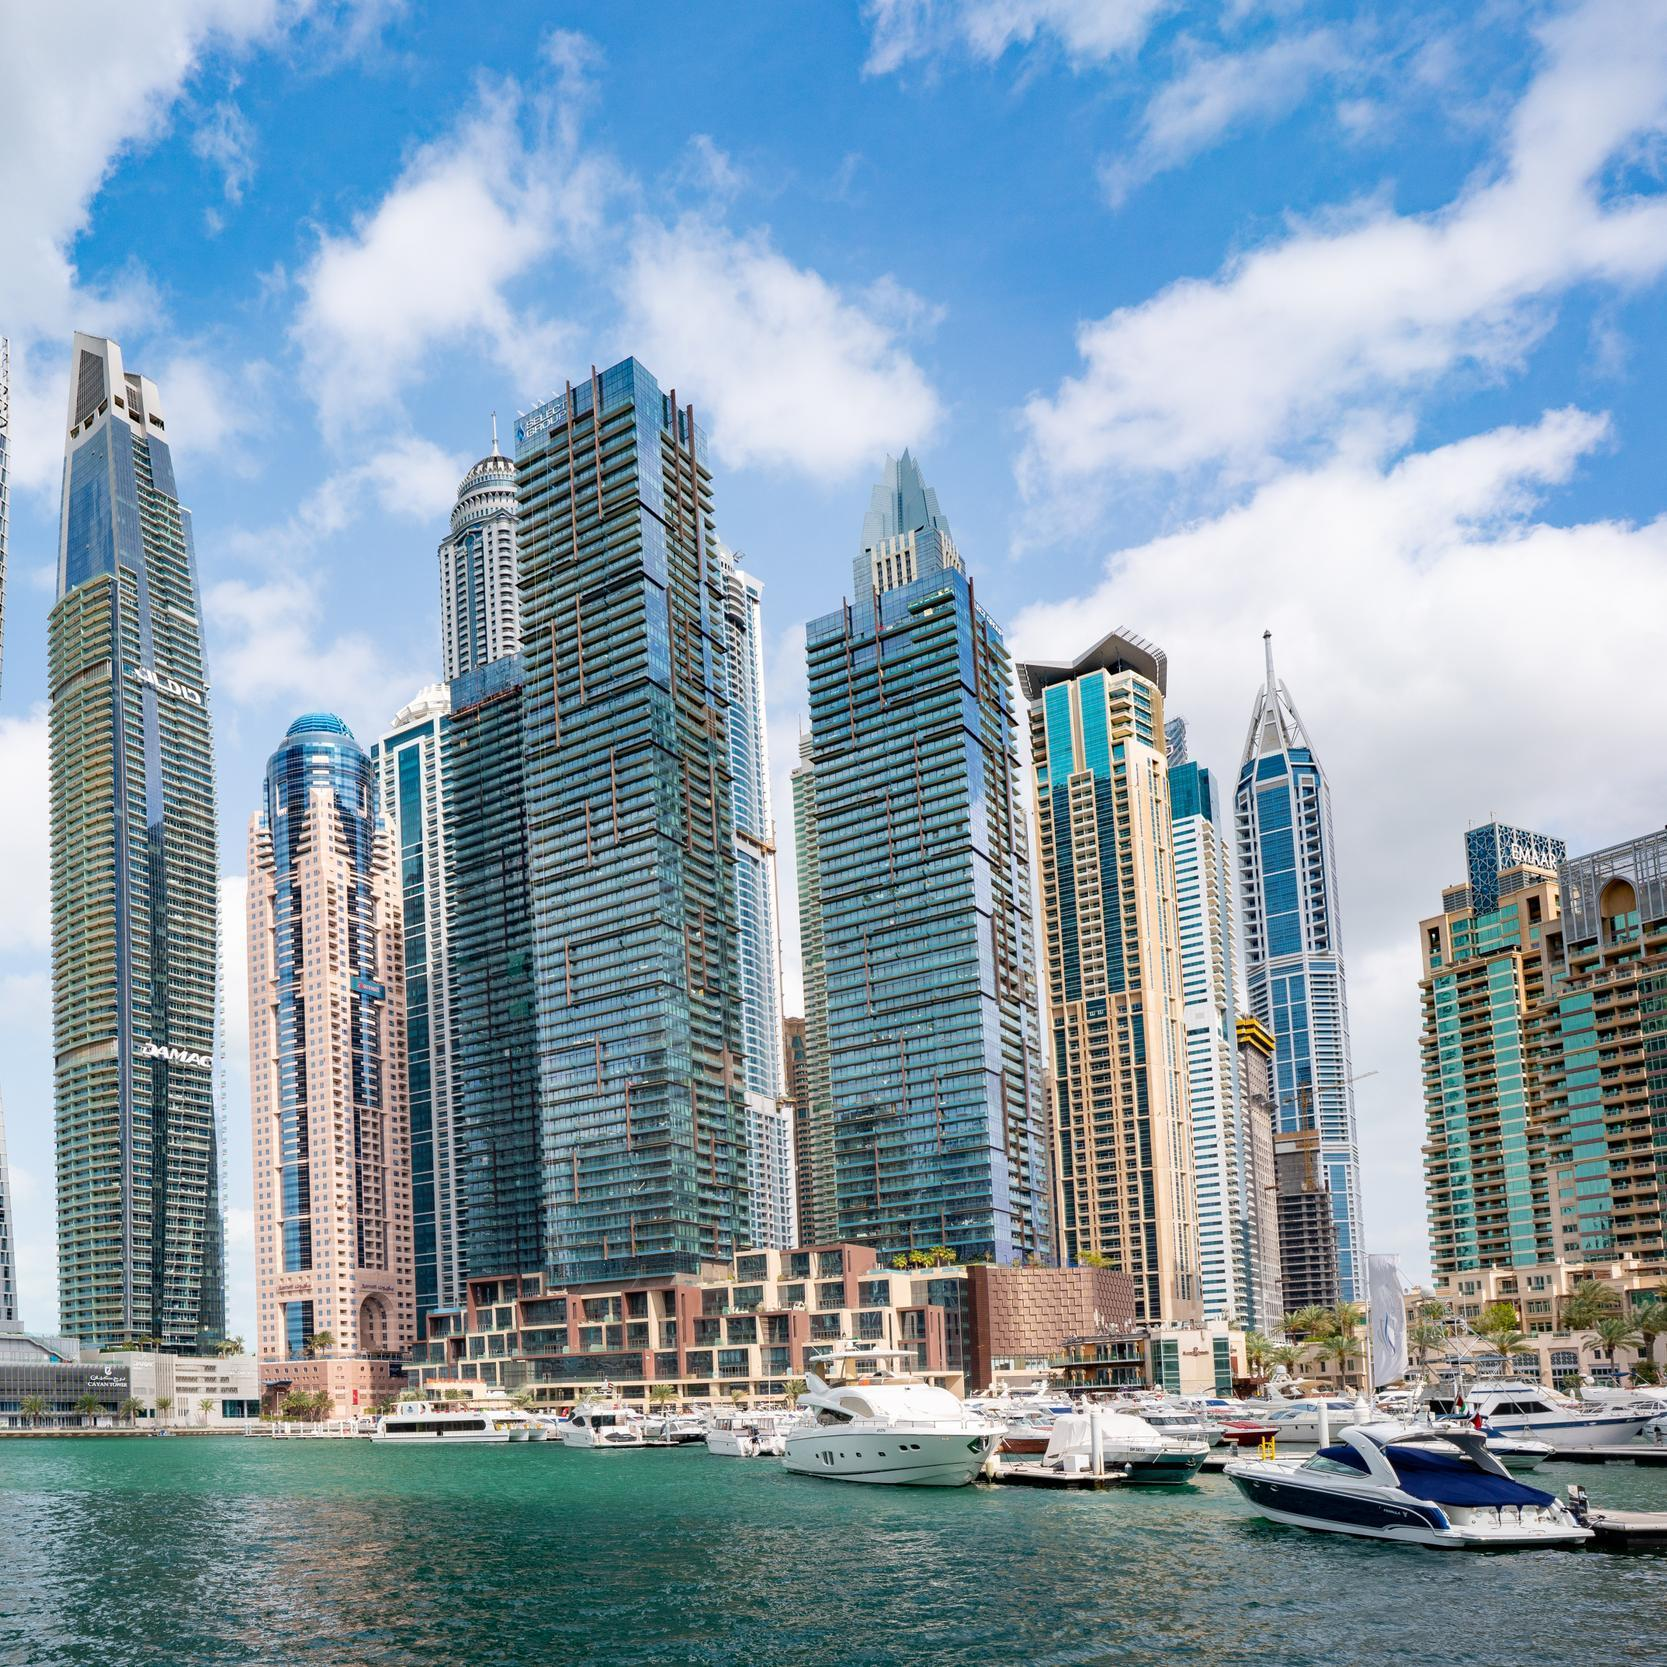 Viaje a Dubái, Emiratos Árabes